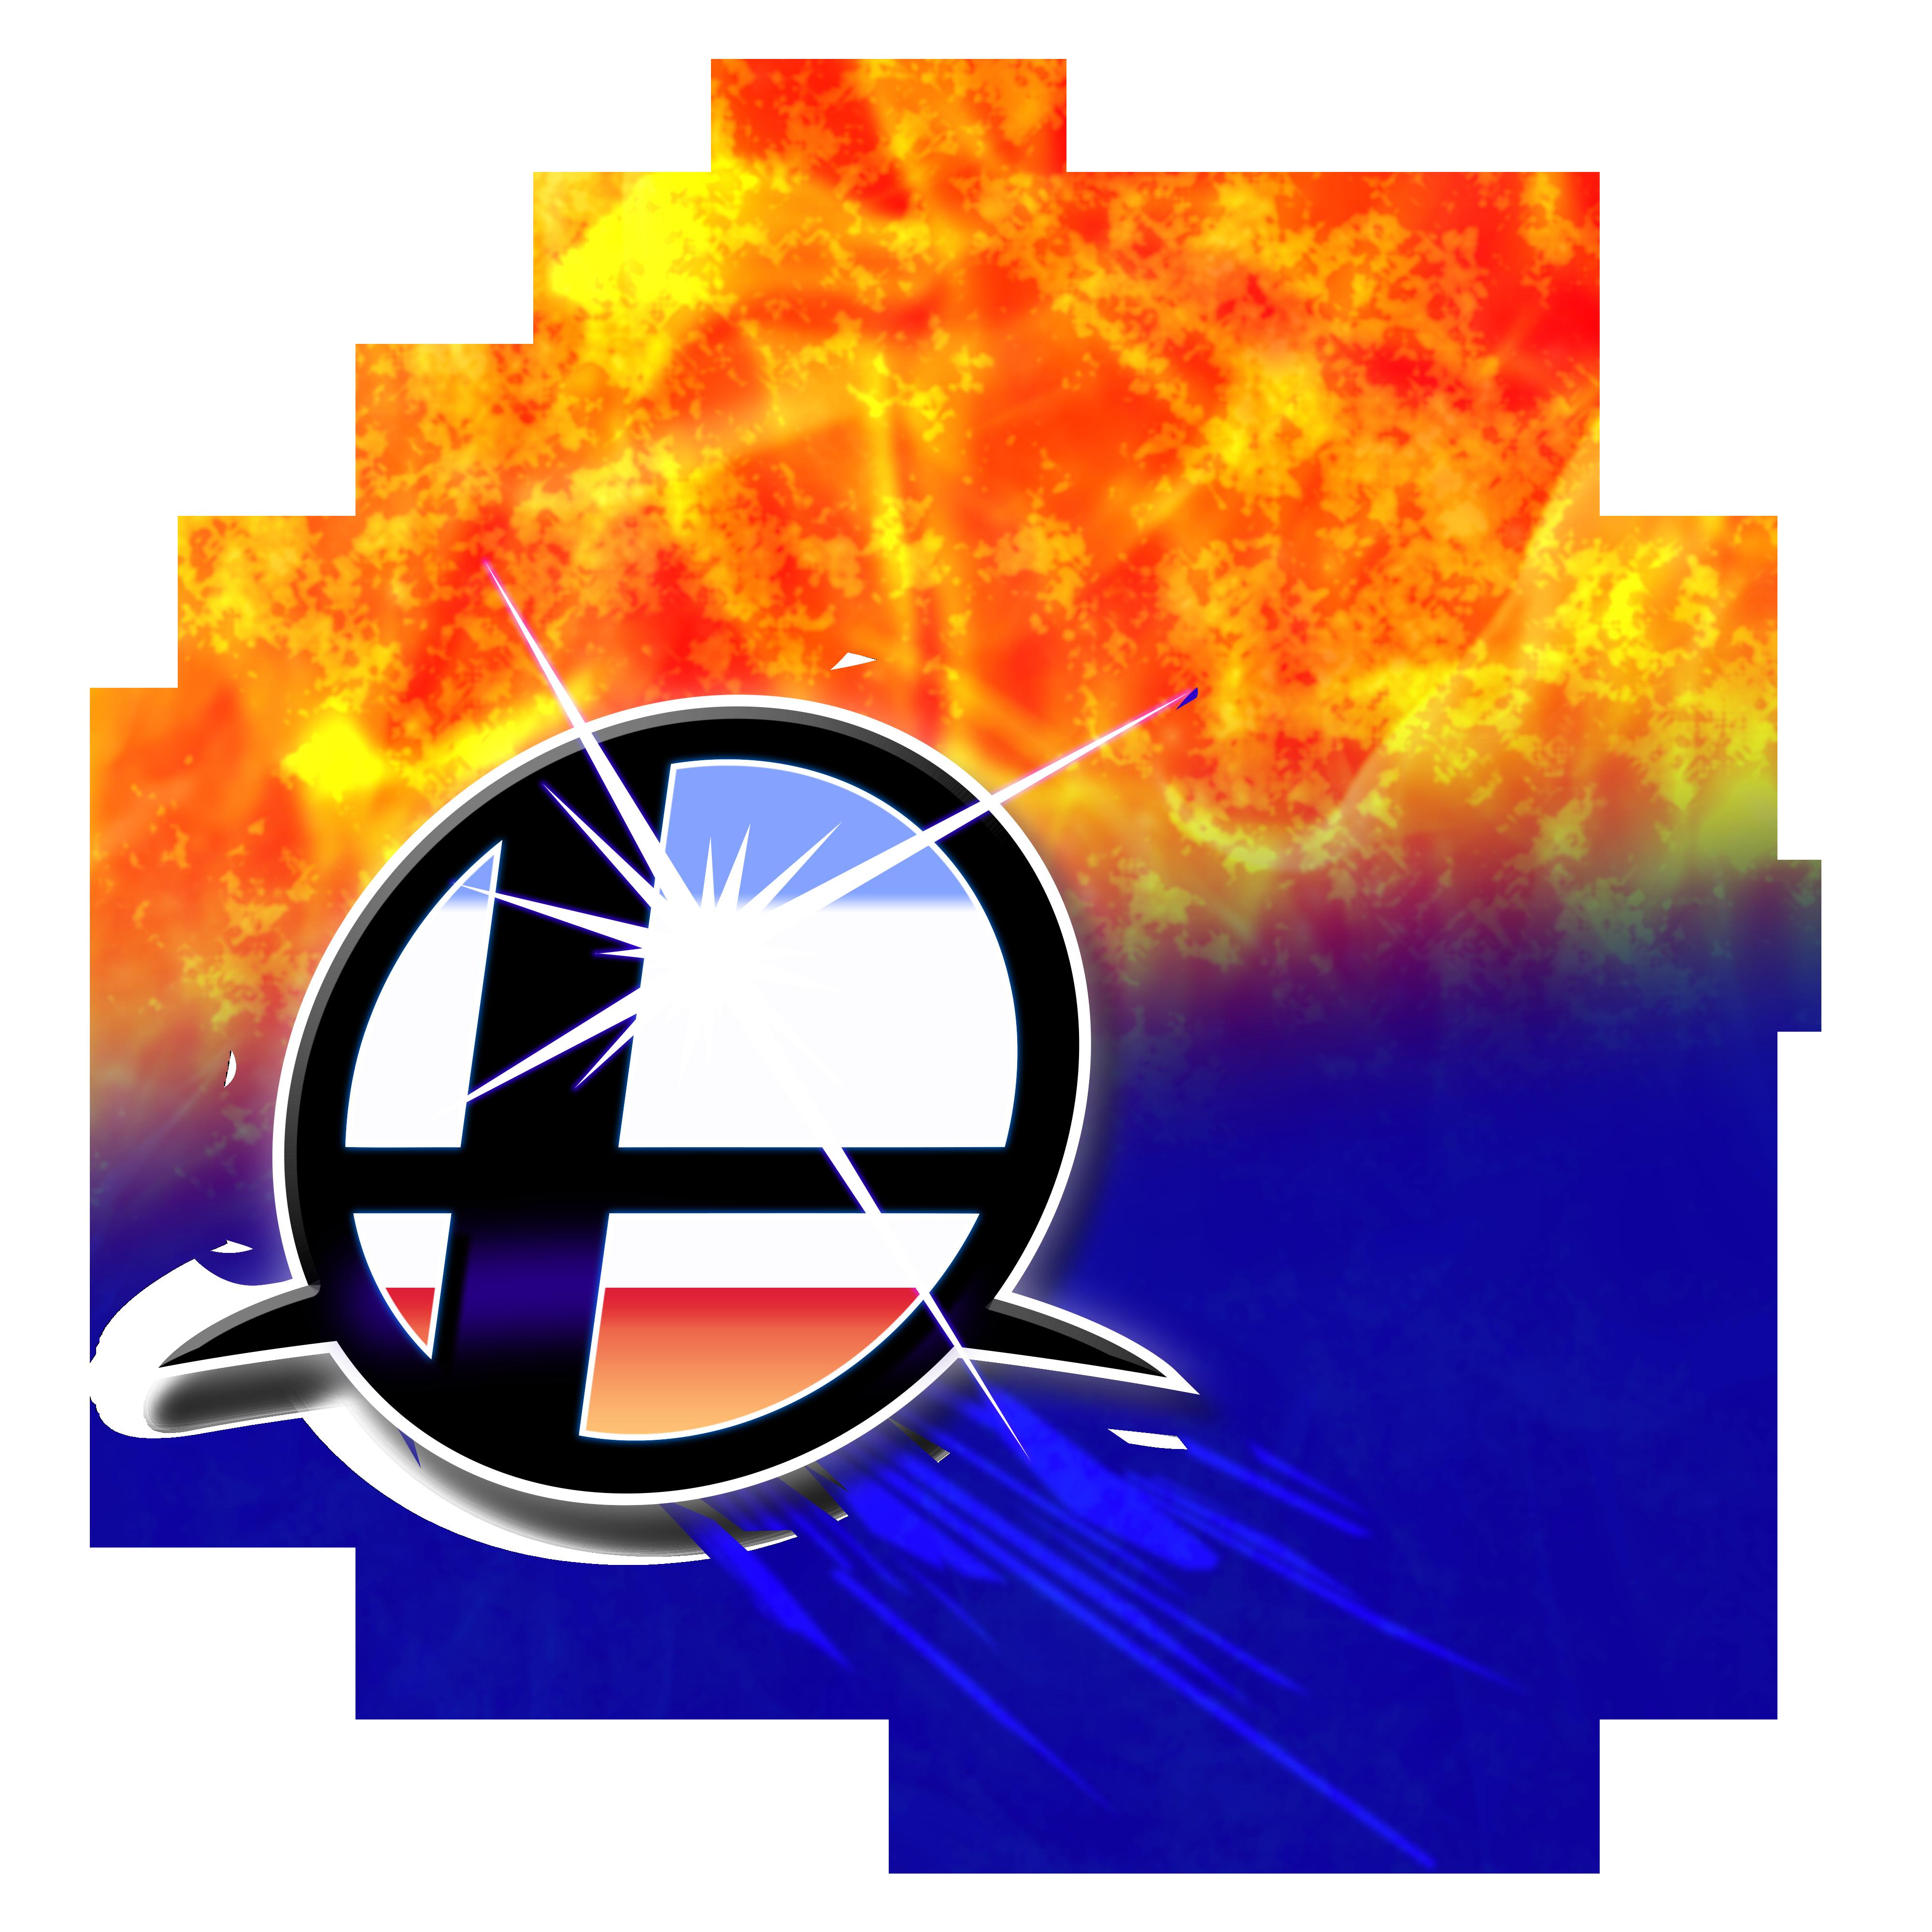 Bagasdi: Flame Super Smash Bros Ultimate Logo